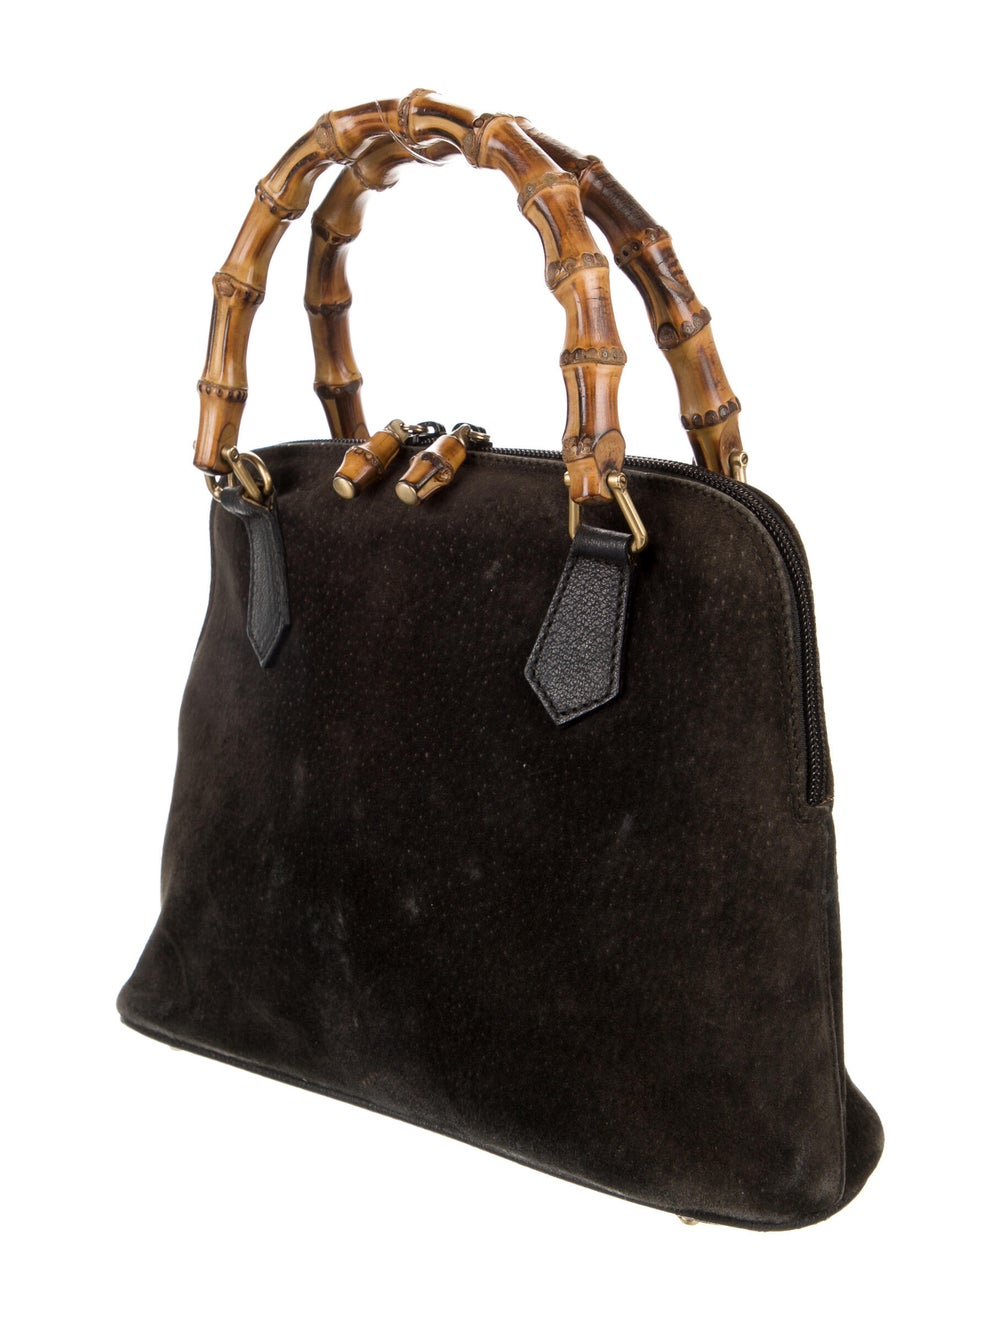 Gucci Mini Bamboo Handle Bag Brown - image 3